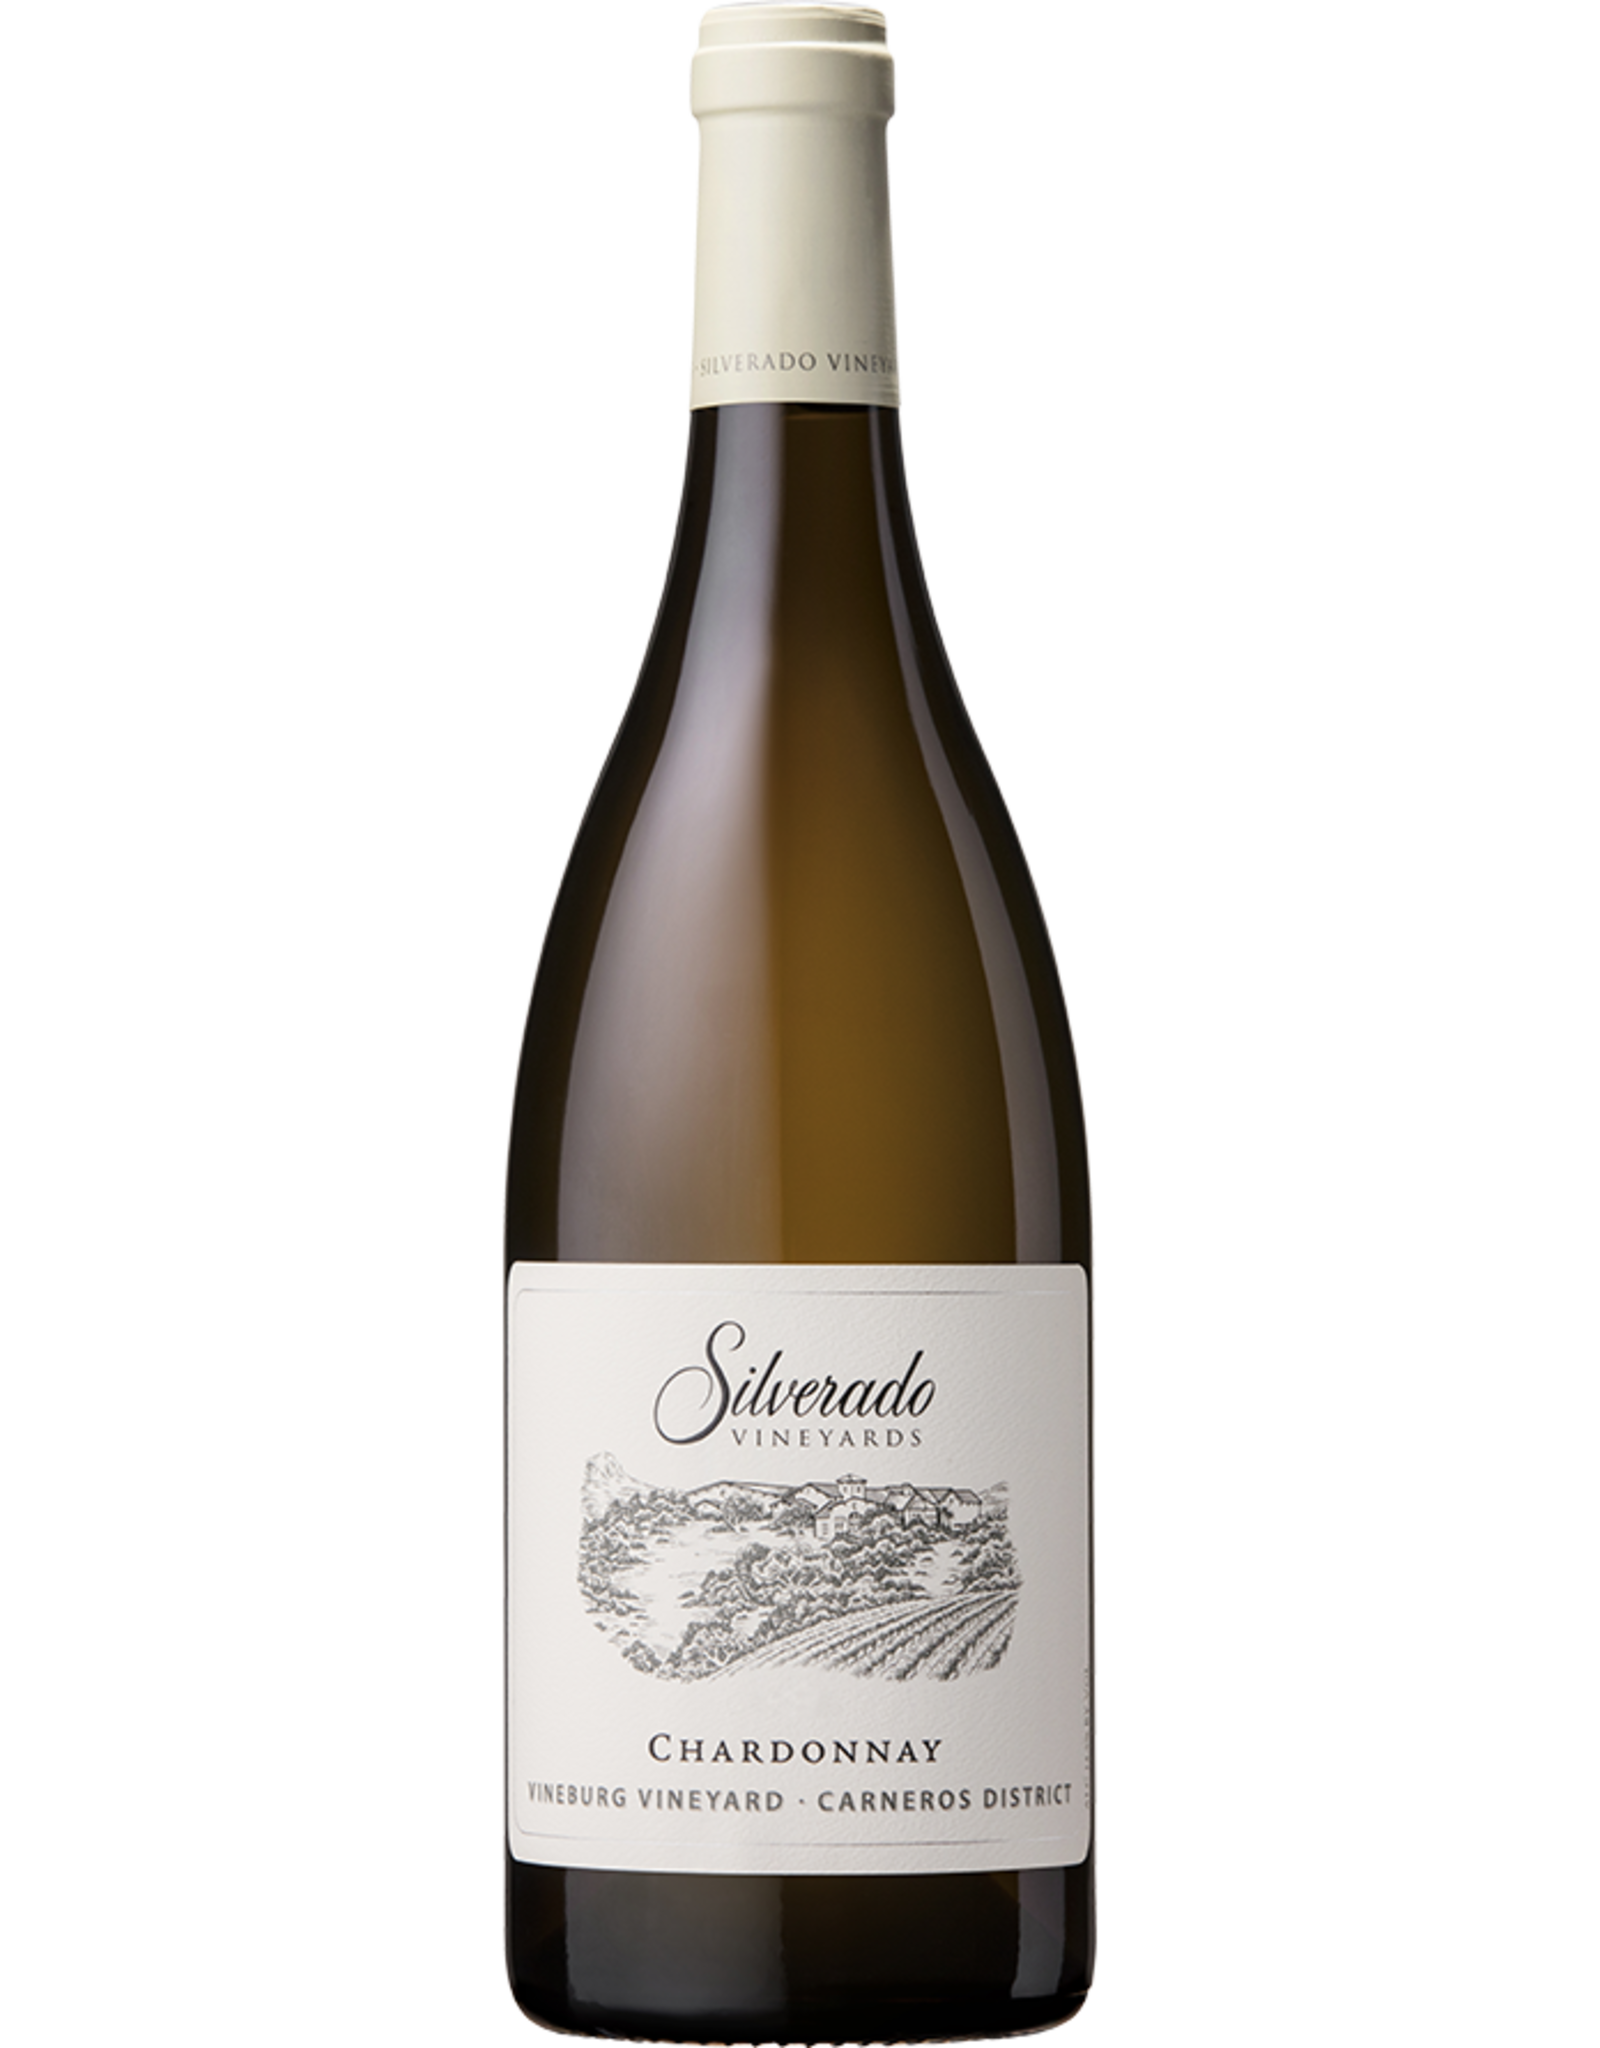 Silverado Vineburg Chardonnay 2018